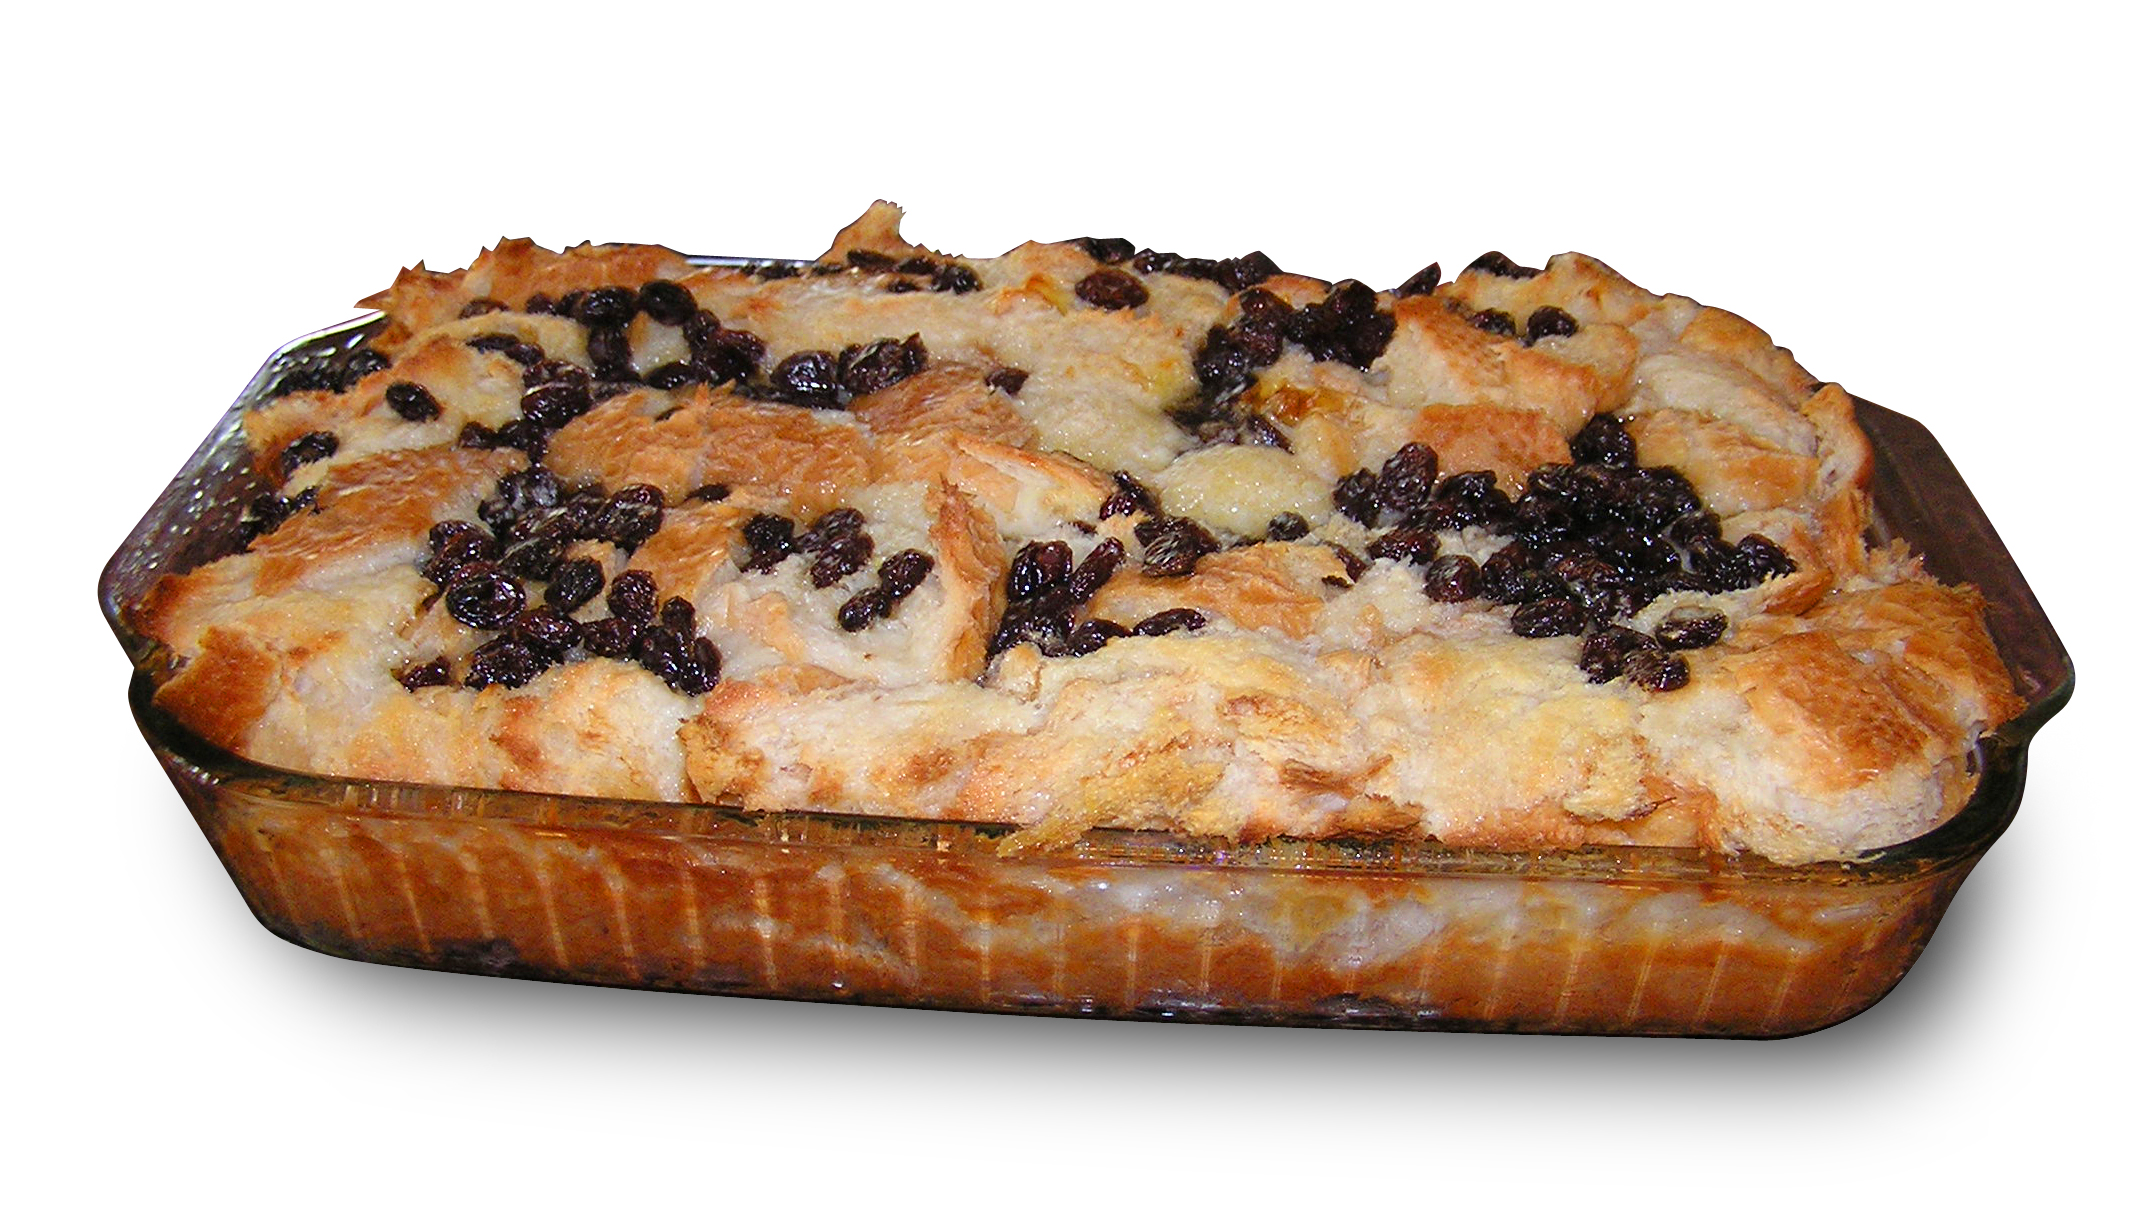 Description Bread pudding on white background.jpg